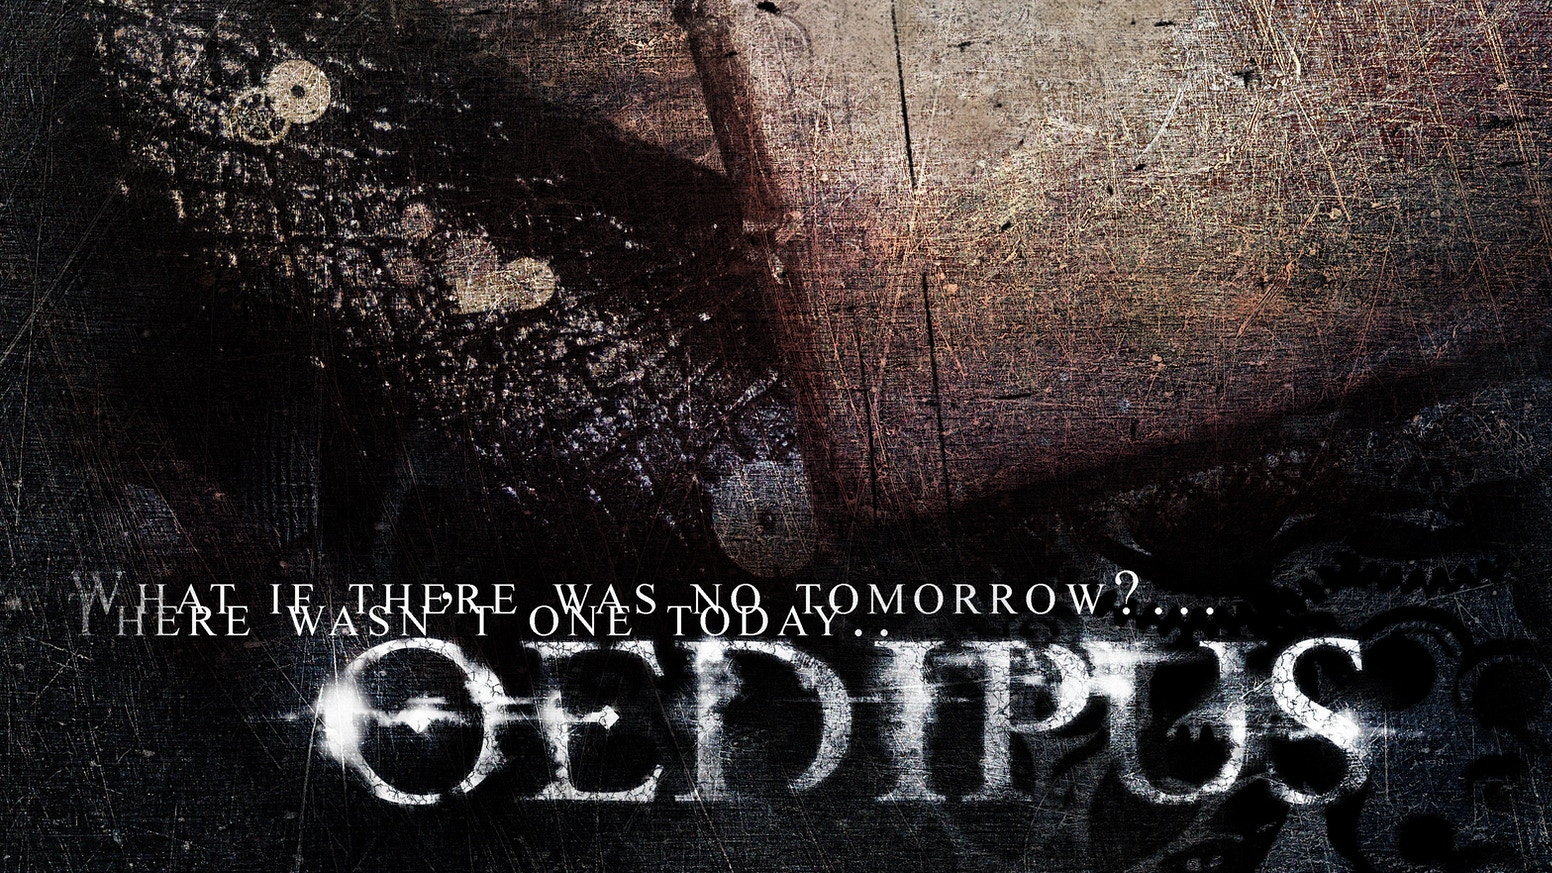 Oedipus A Short Film By Roxanne Bordeaux Kickstarter